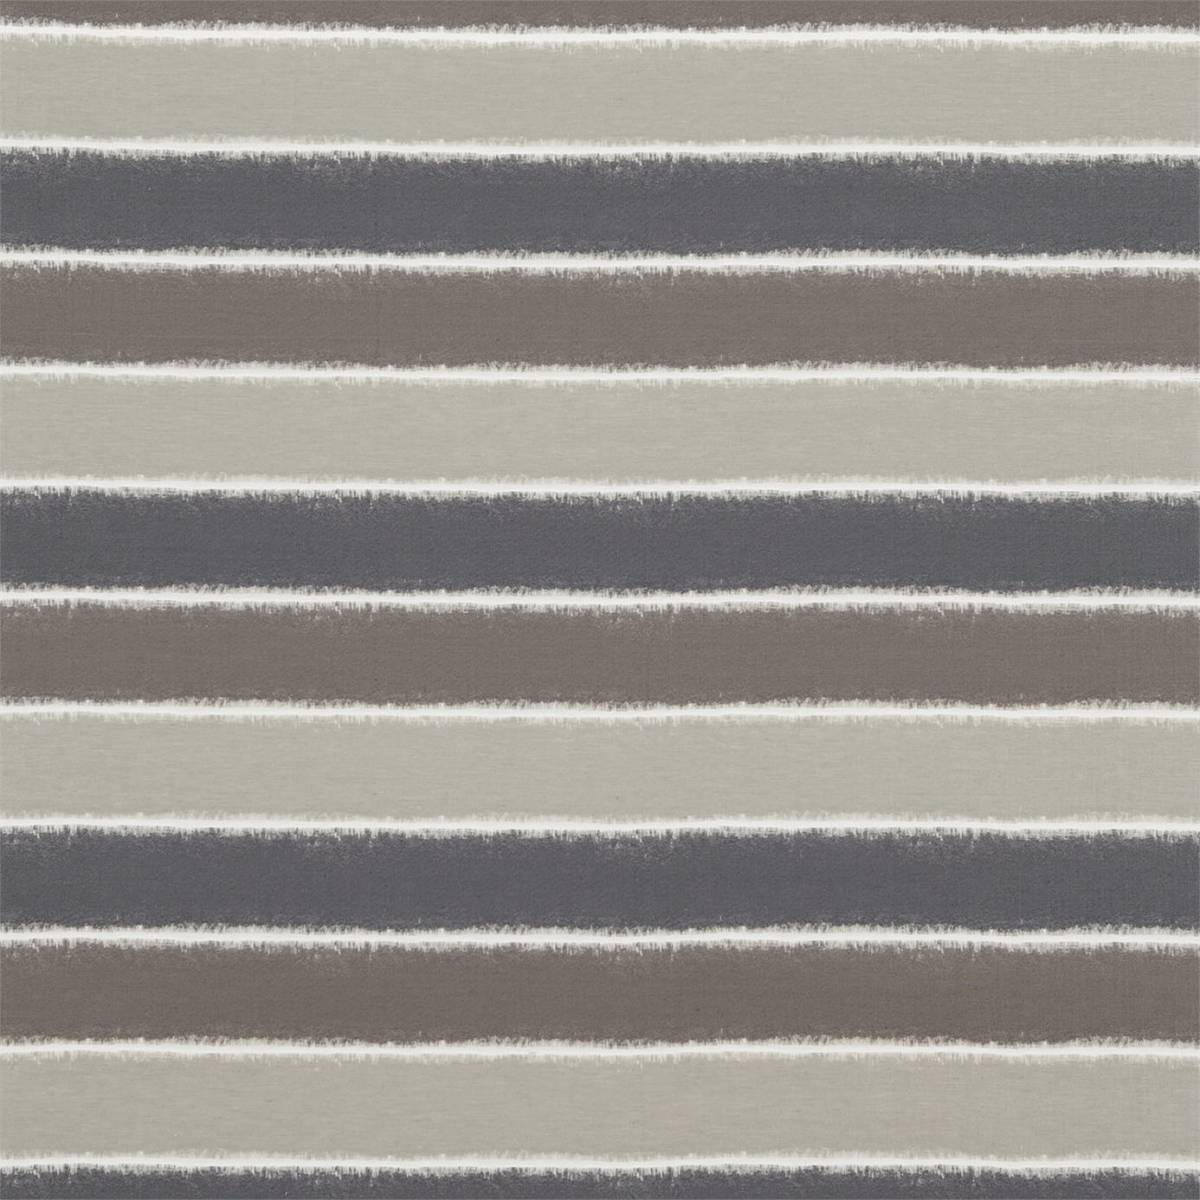 Plateau Fabric Slate Walnut Pebble 131114 Harlequin